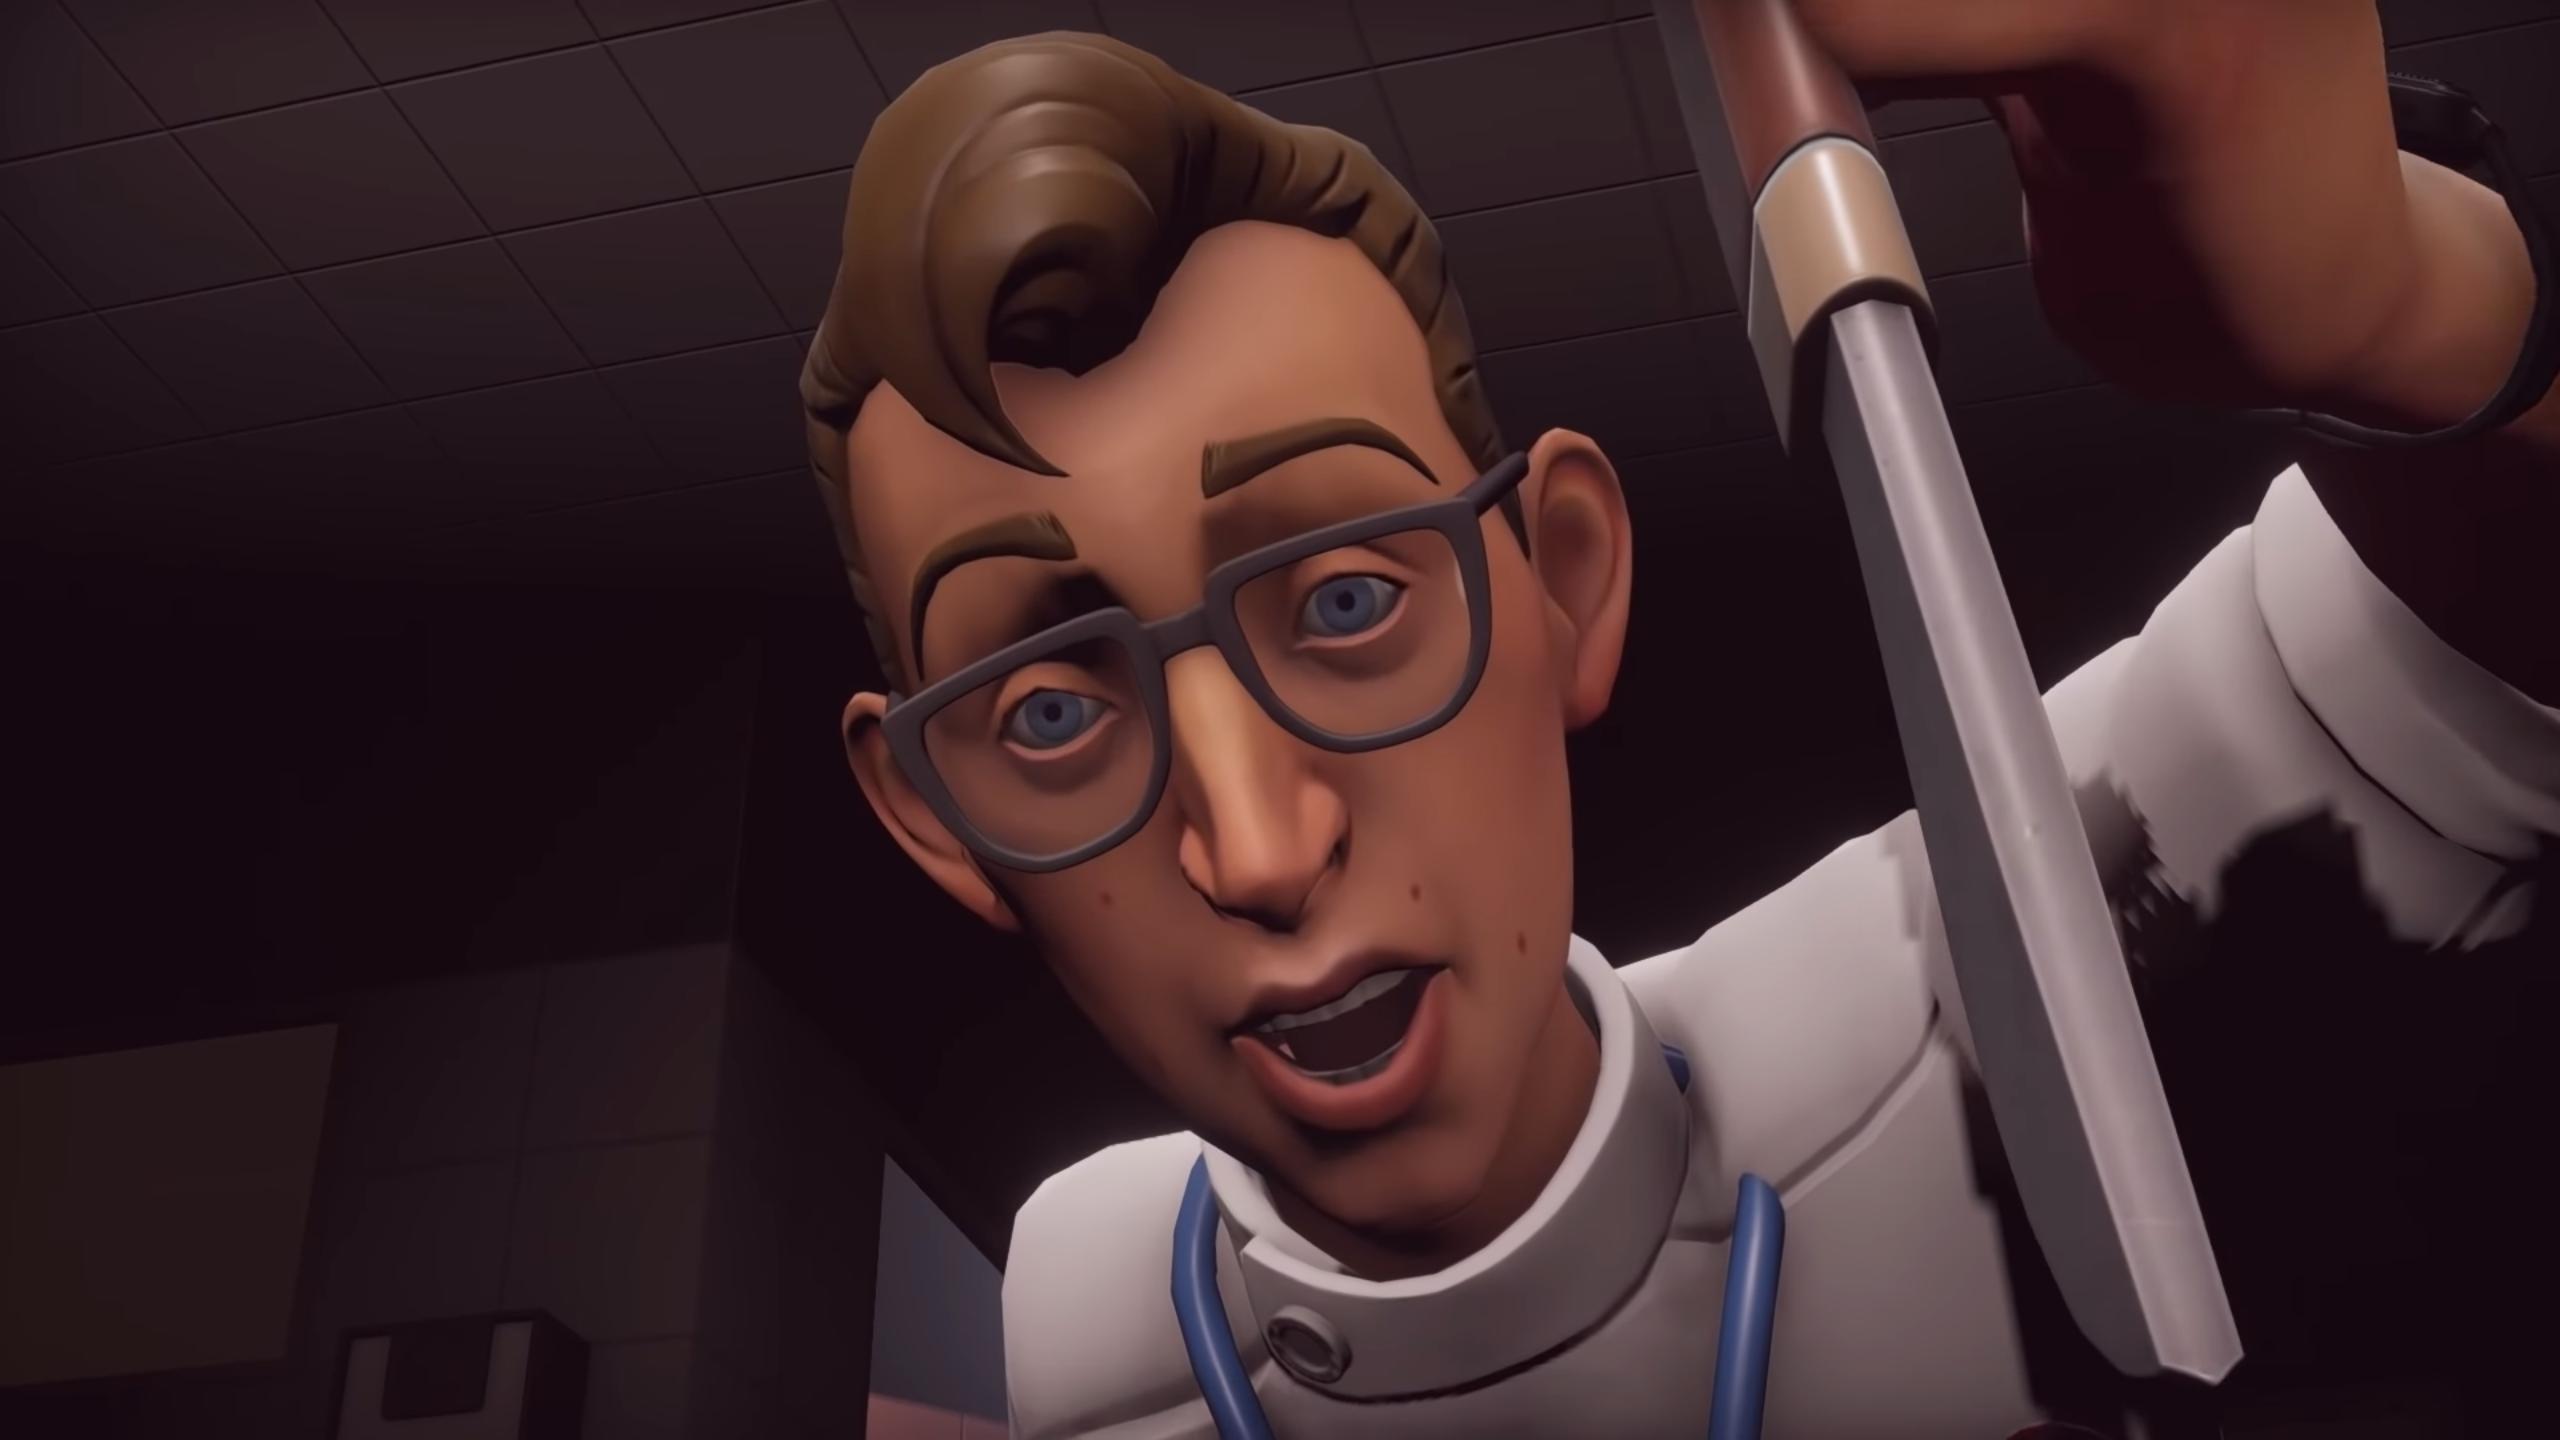 Here S A New Surgeon Simulator 2 Gameplay Trailer It Has Great Music Pc Gamer